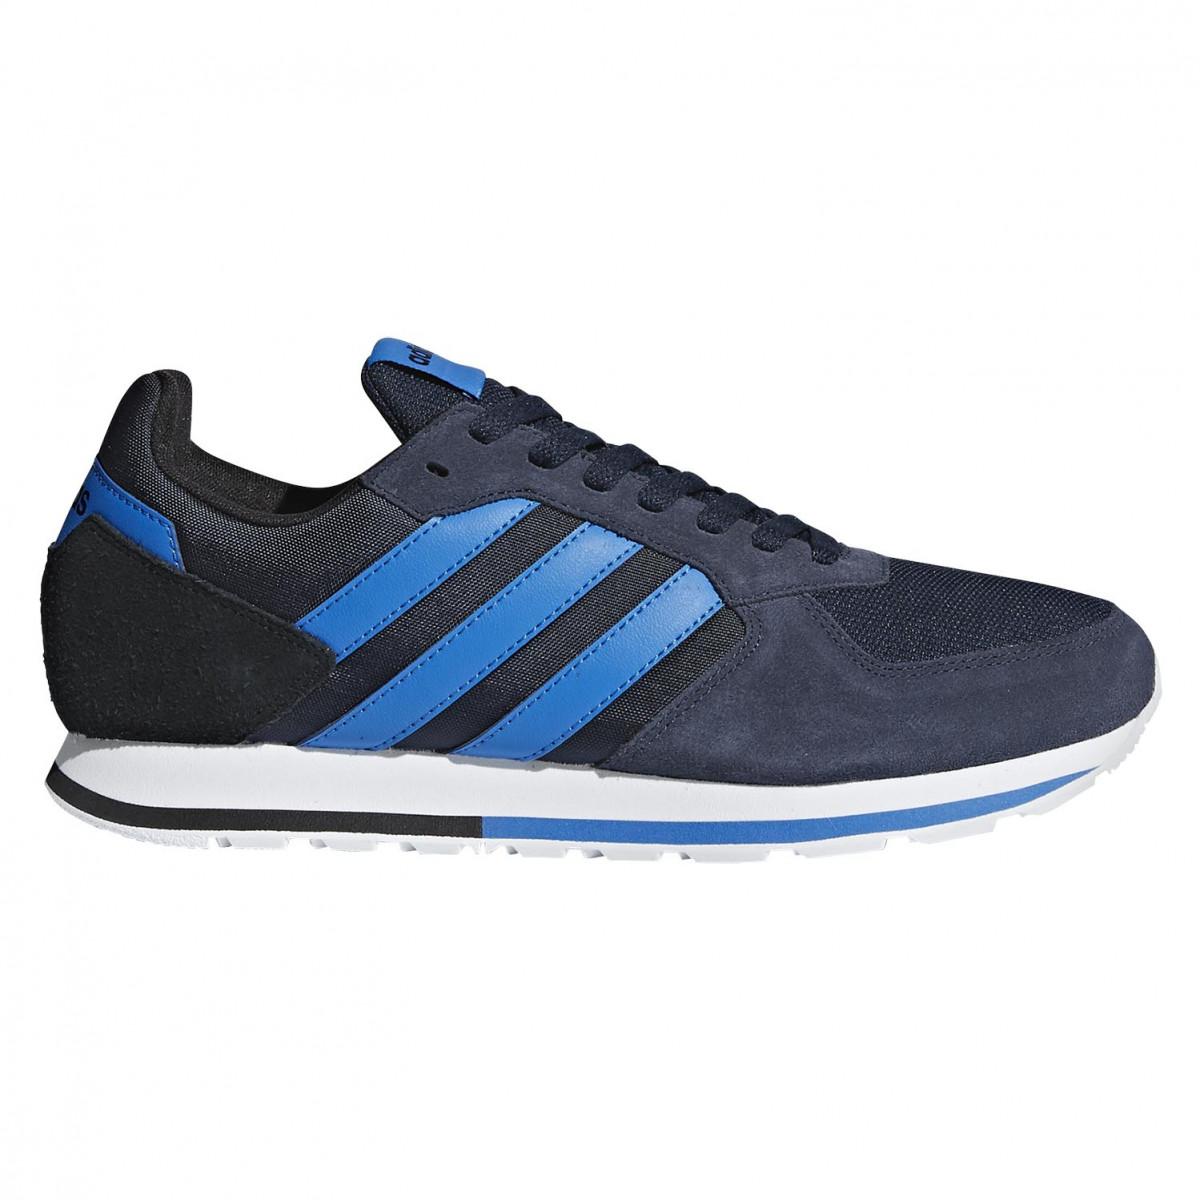 Adidas Zapatilla 8K RUintBD